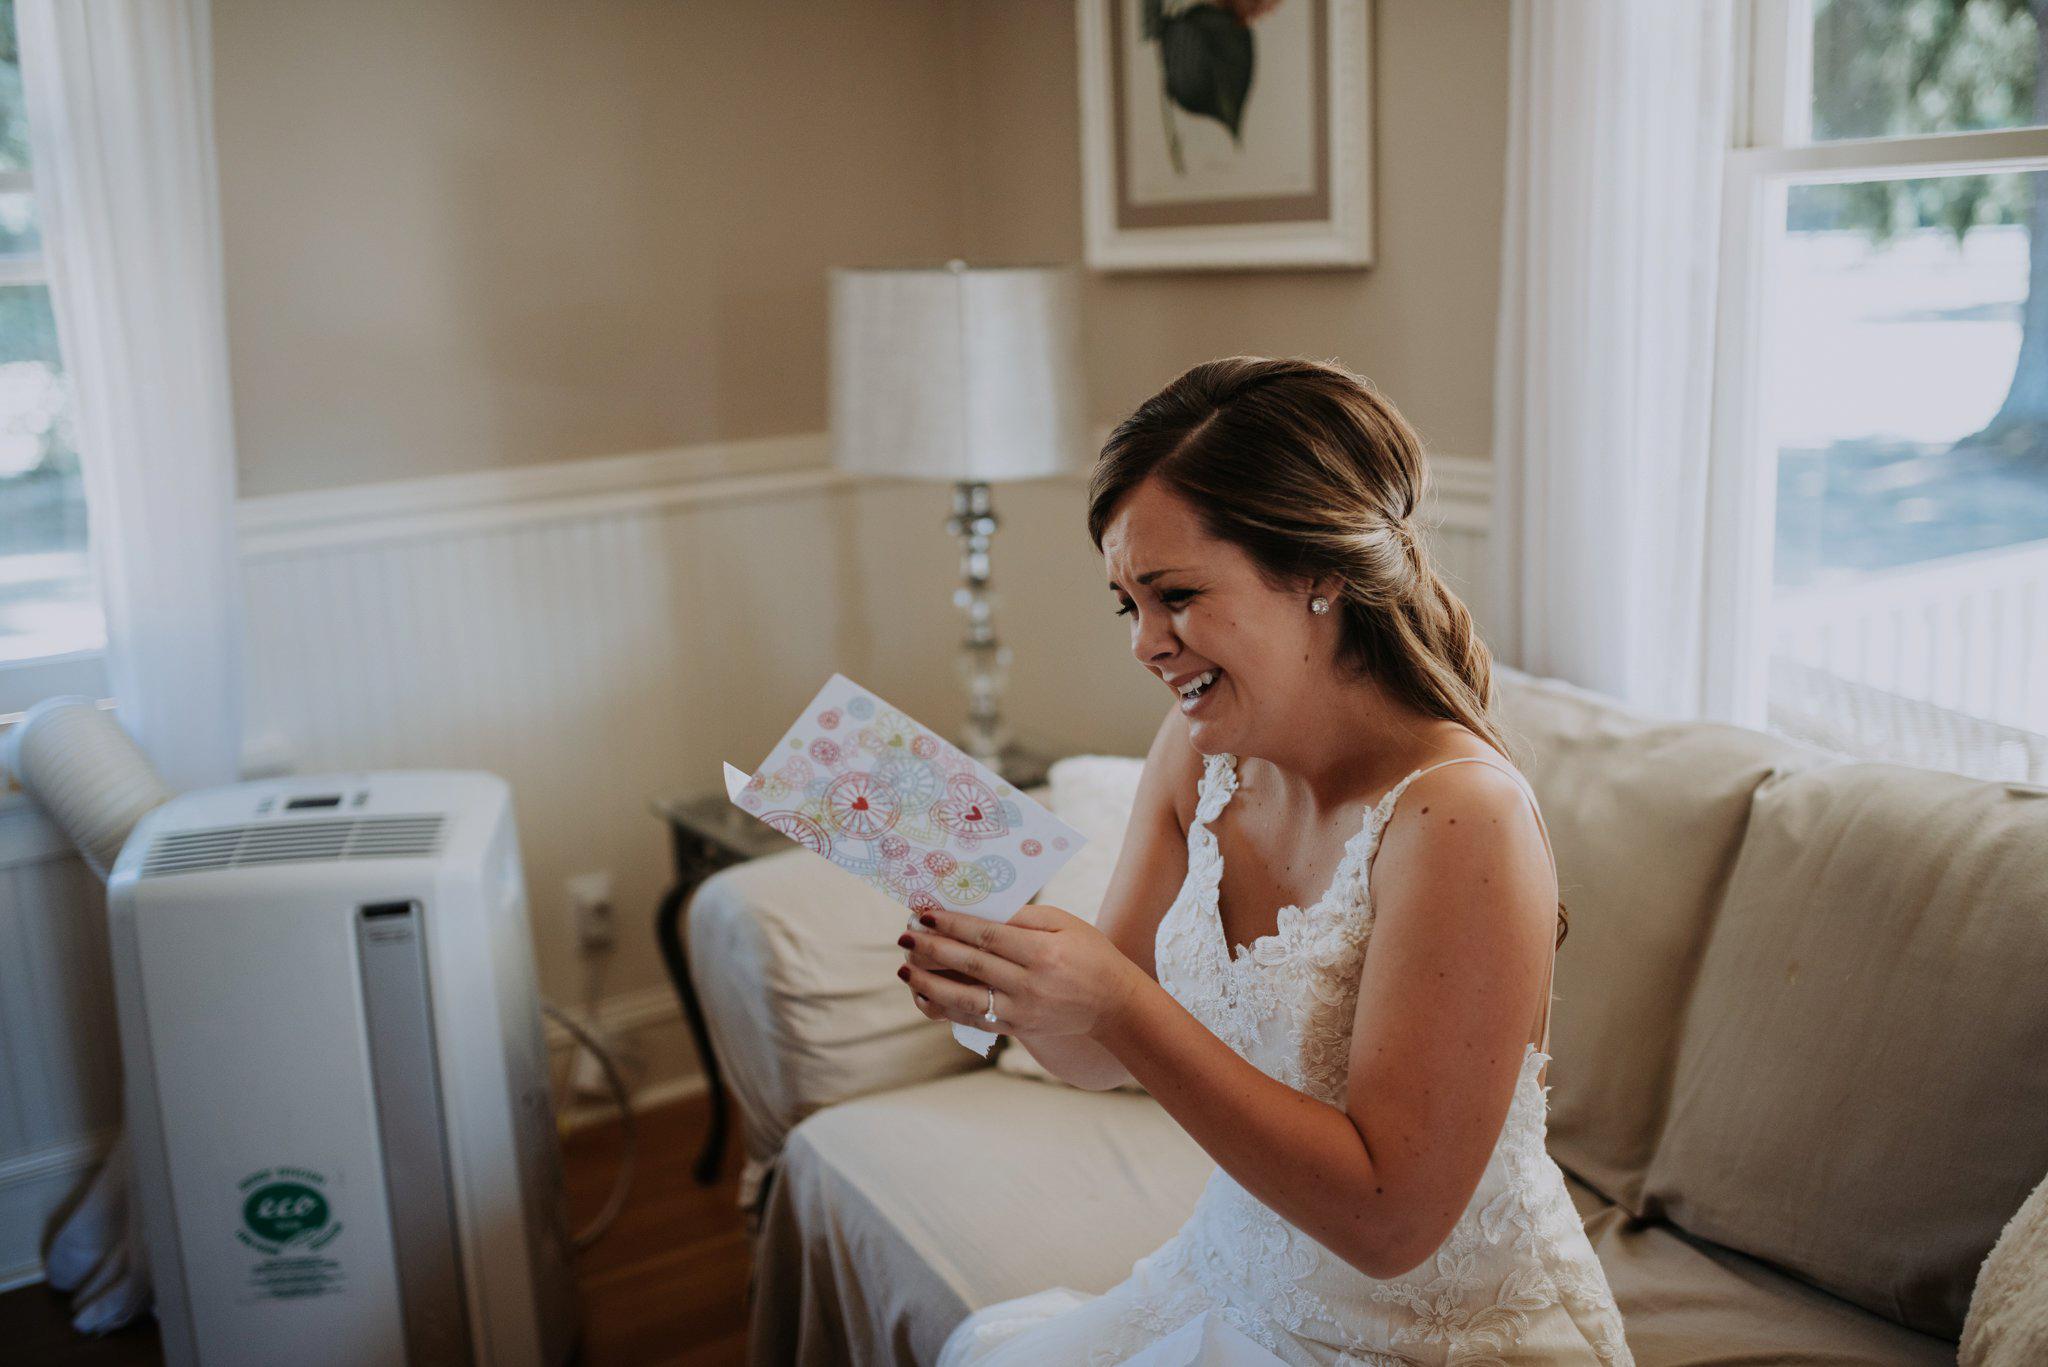 kristen-and-cody-the-kelley-farm-wedding-seattle-photographer-caitlyn-nikula-17.jpg